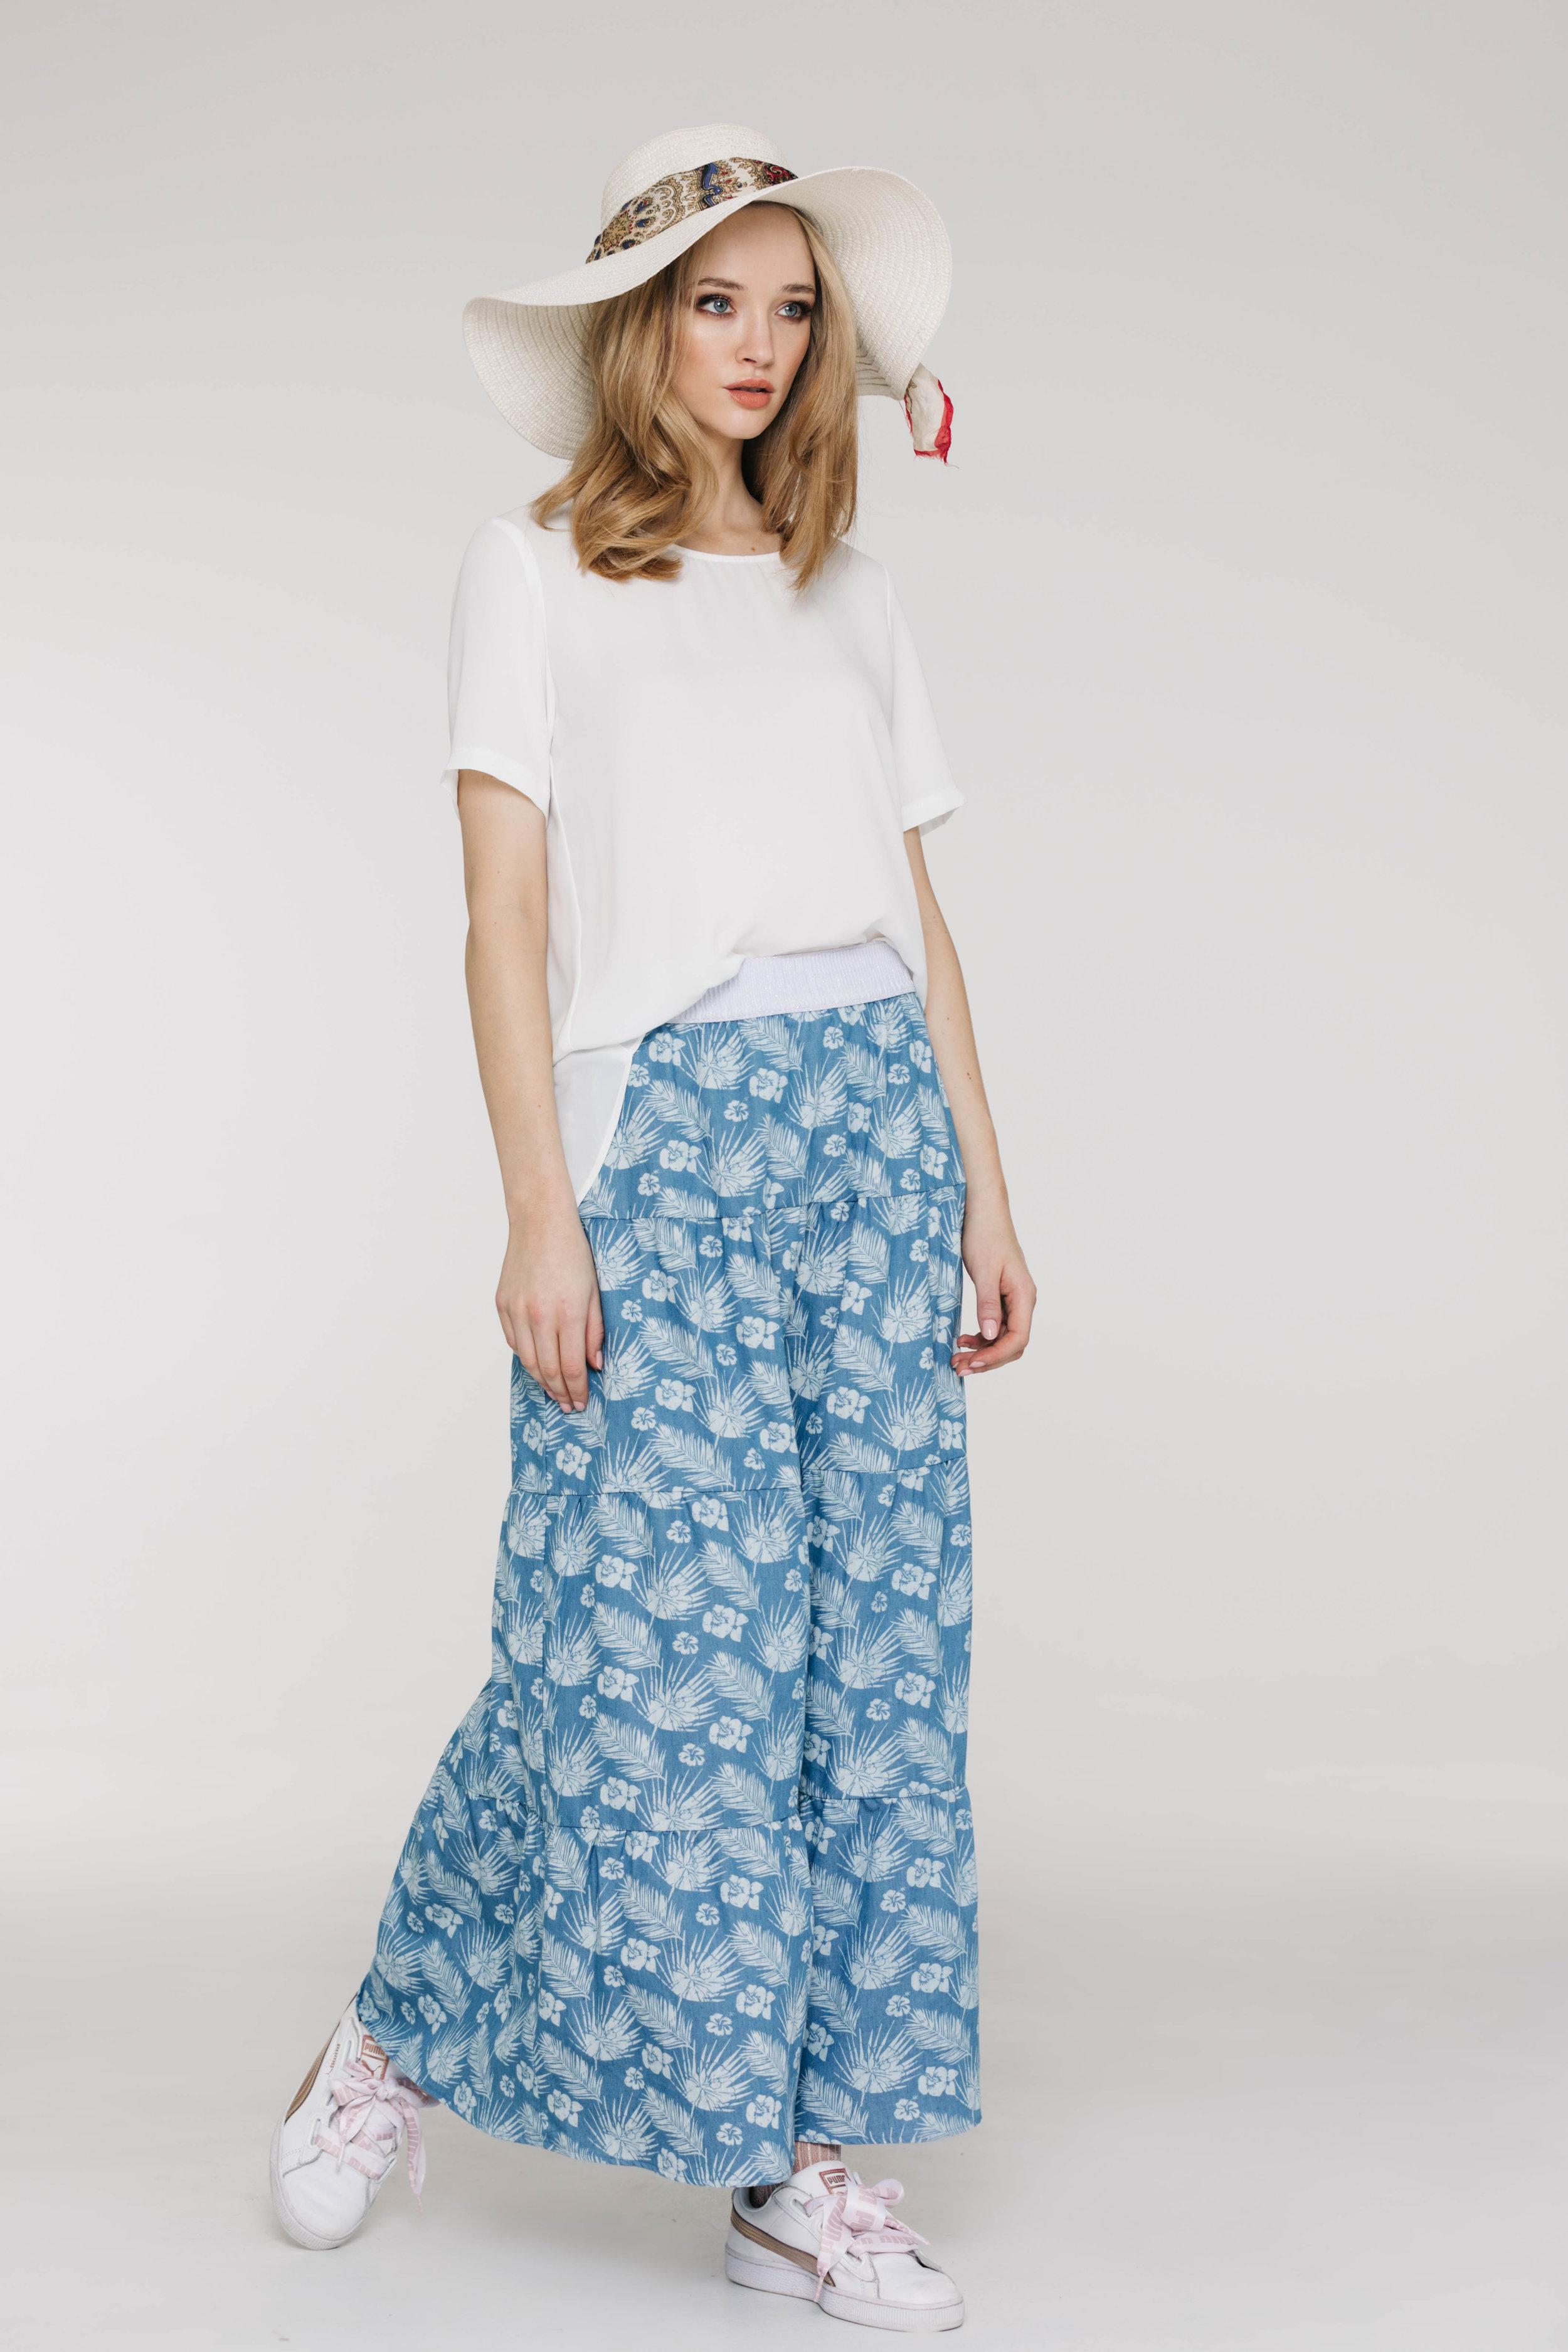 New Tux Tee 5173PA White, Dolly Skirt 6519N Hawaiian Denim